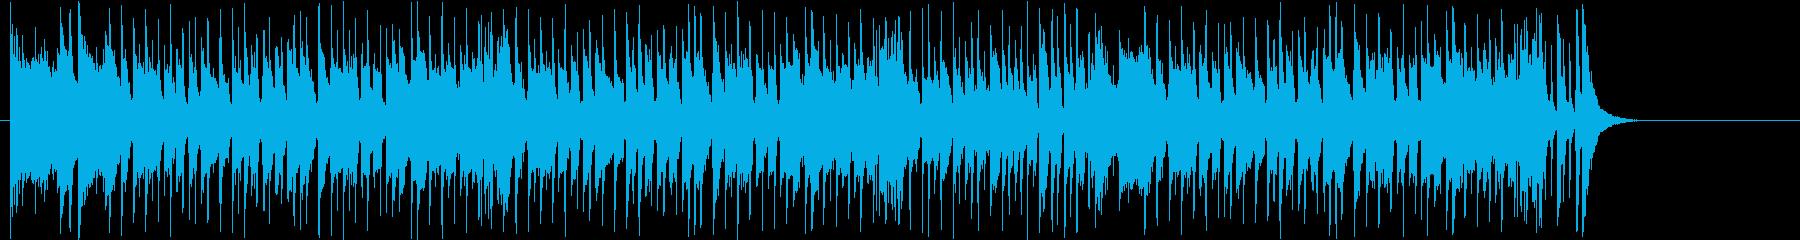 CM 情報 店内 PR ショッピングの再生済みの波形